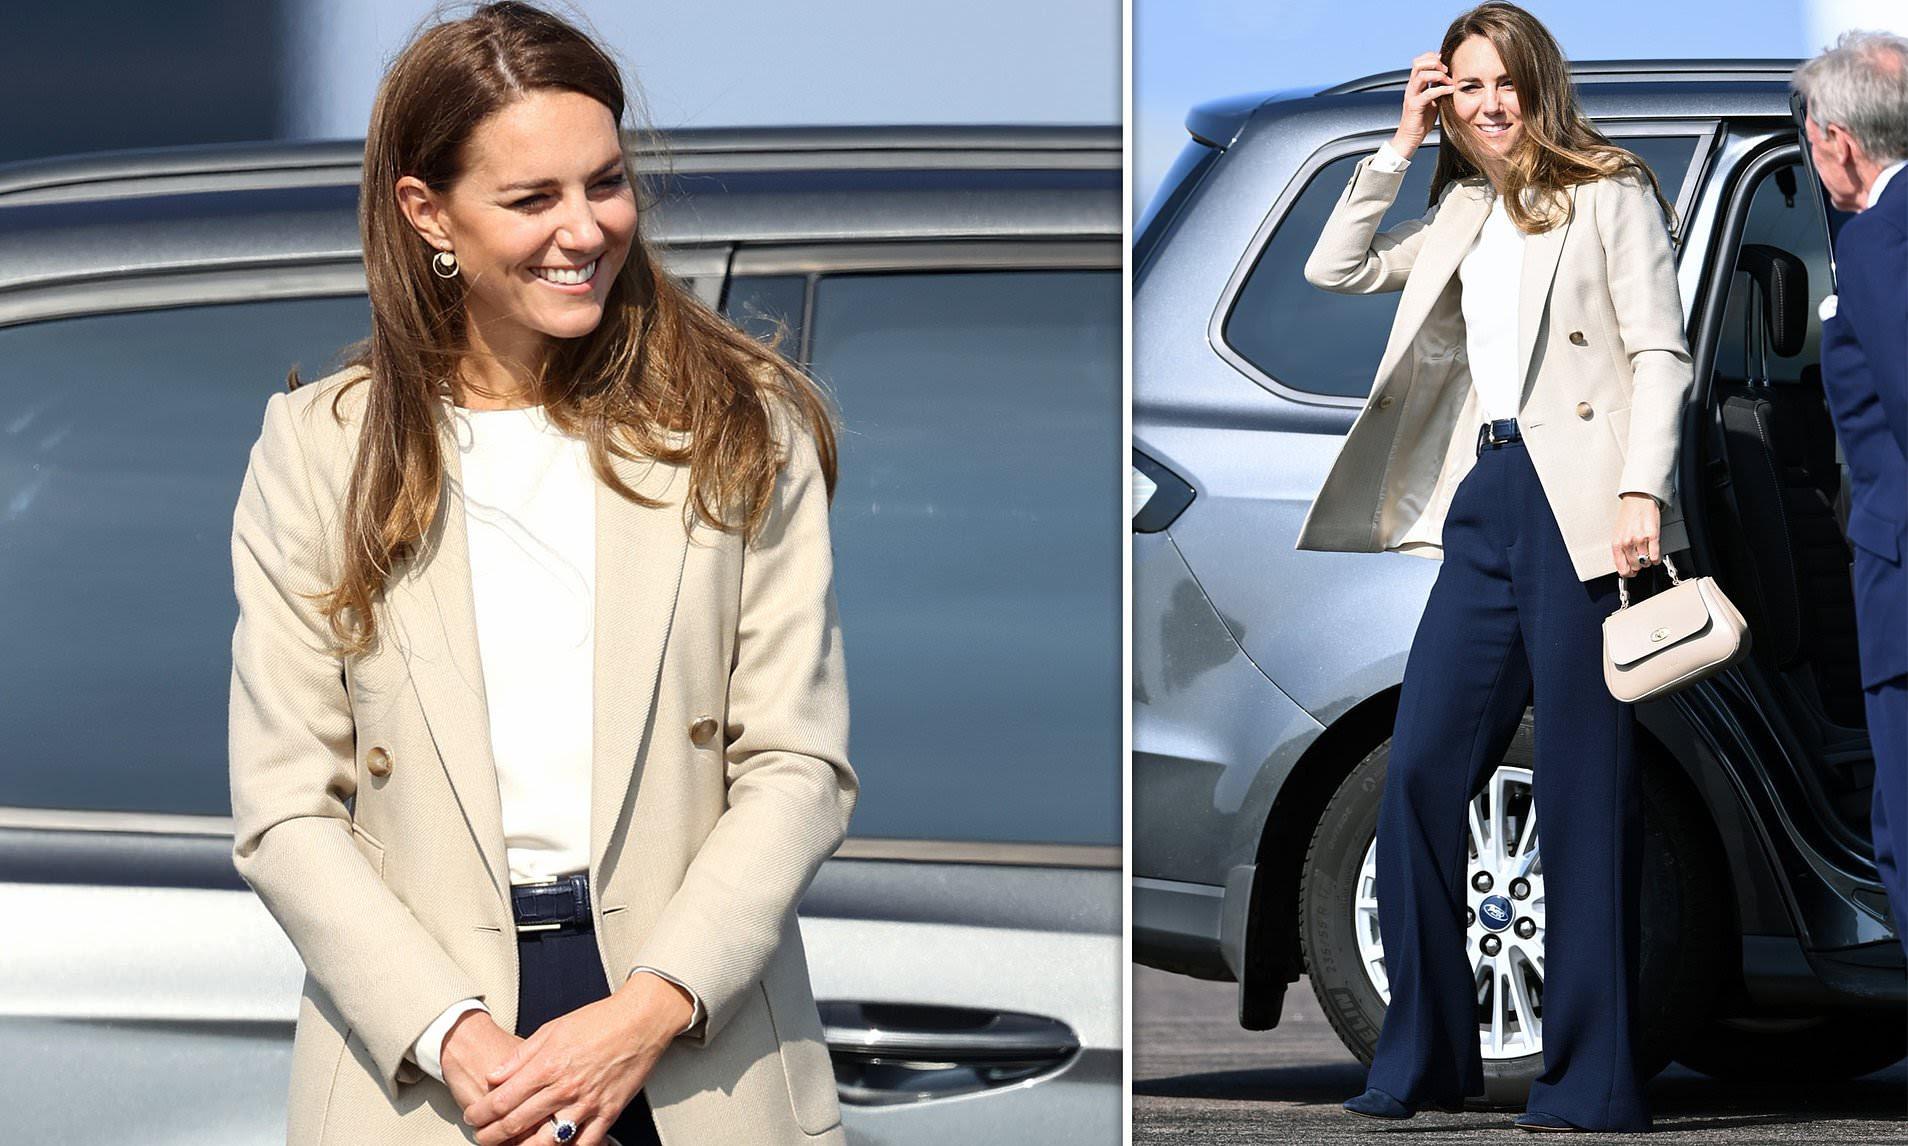 Kate Middleton looks effortlessly stylish in a £285 Reiss blazer